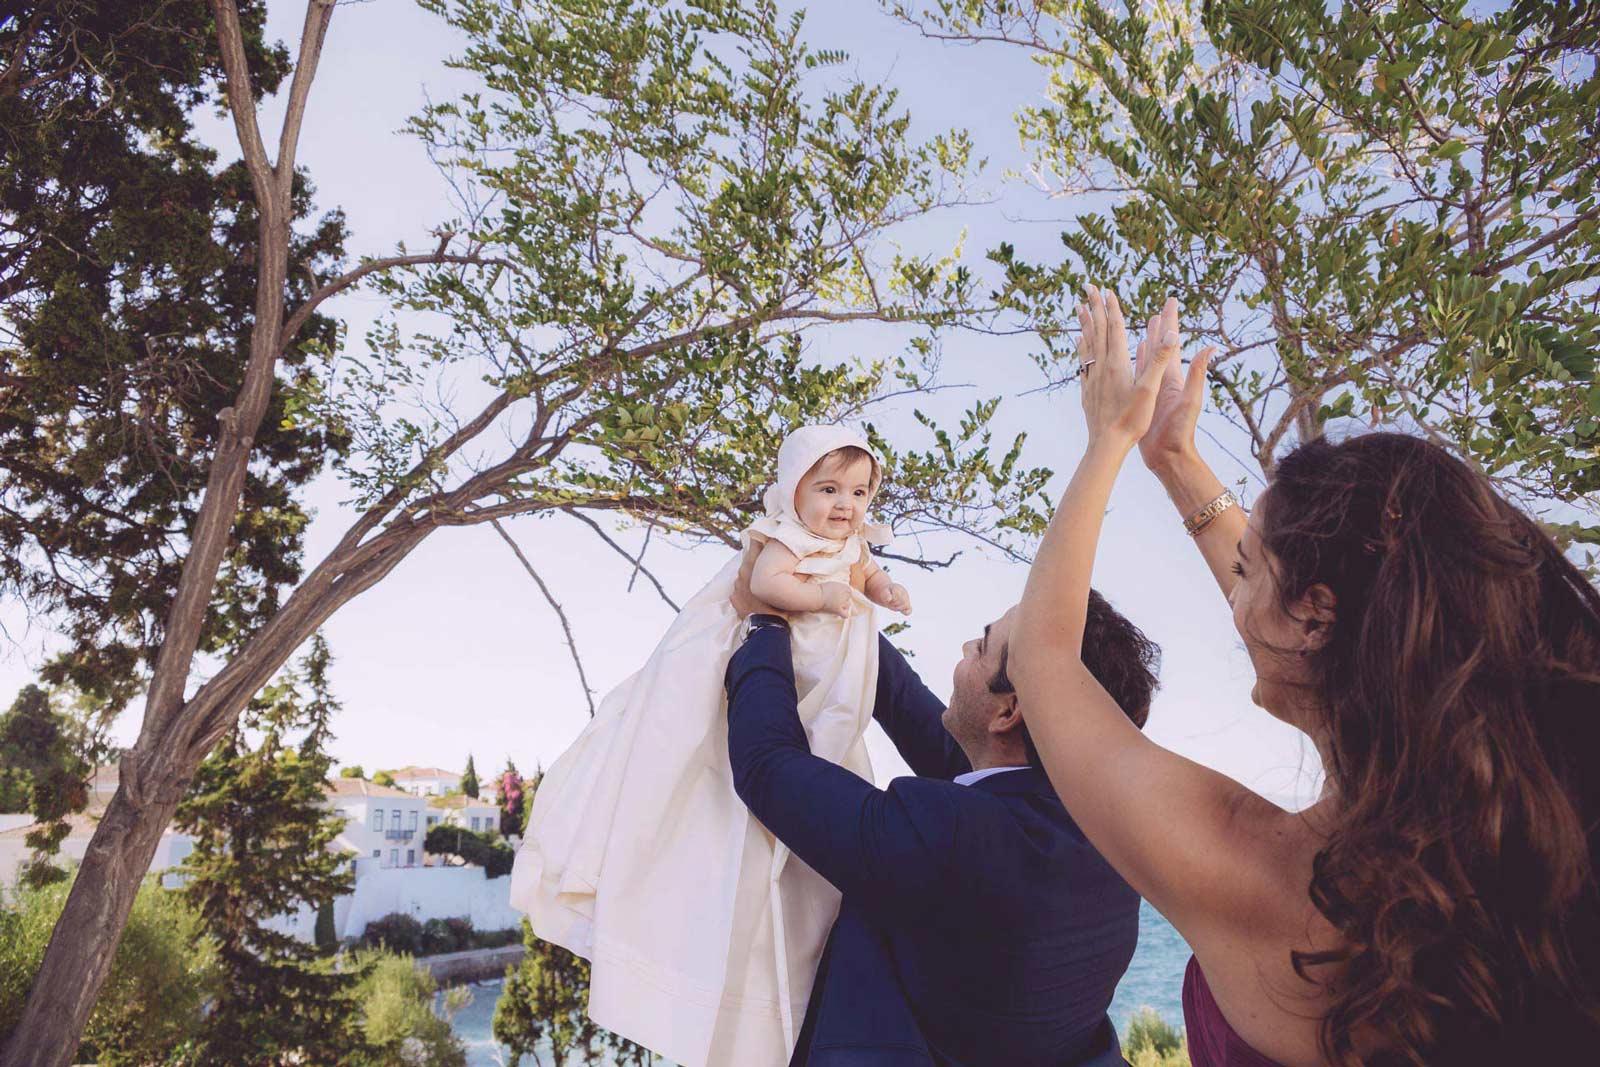 073 PhotoVaptisis βαπτιση σπετσεσ φωτογραφοσ vaptisi koritsi agios nikolaos spestes island photographer